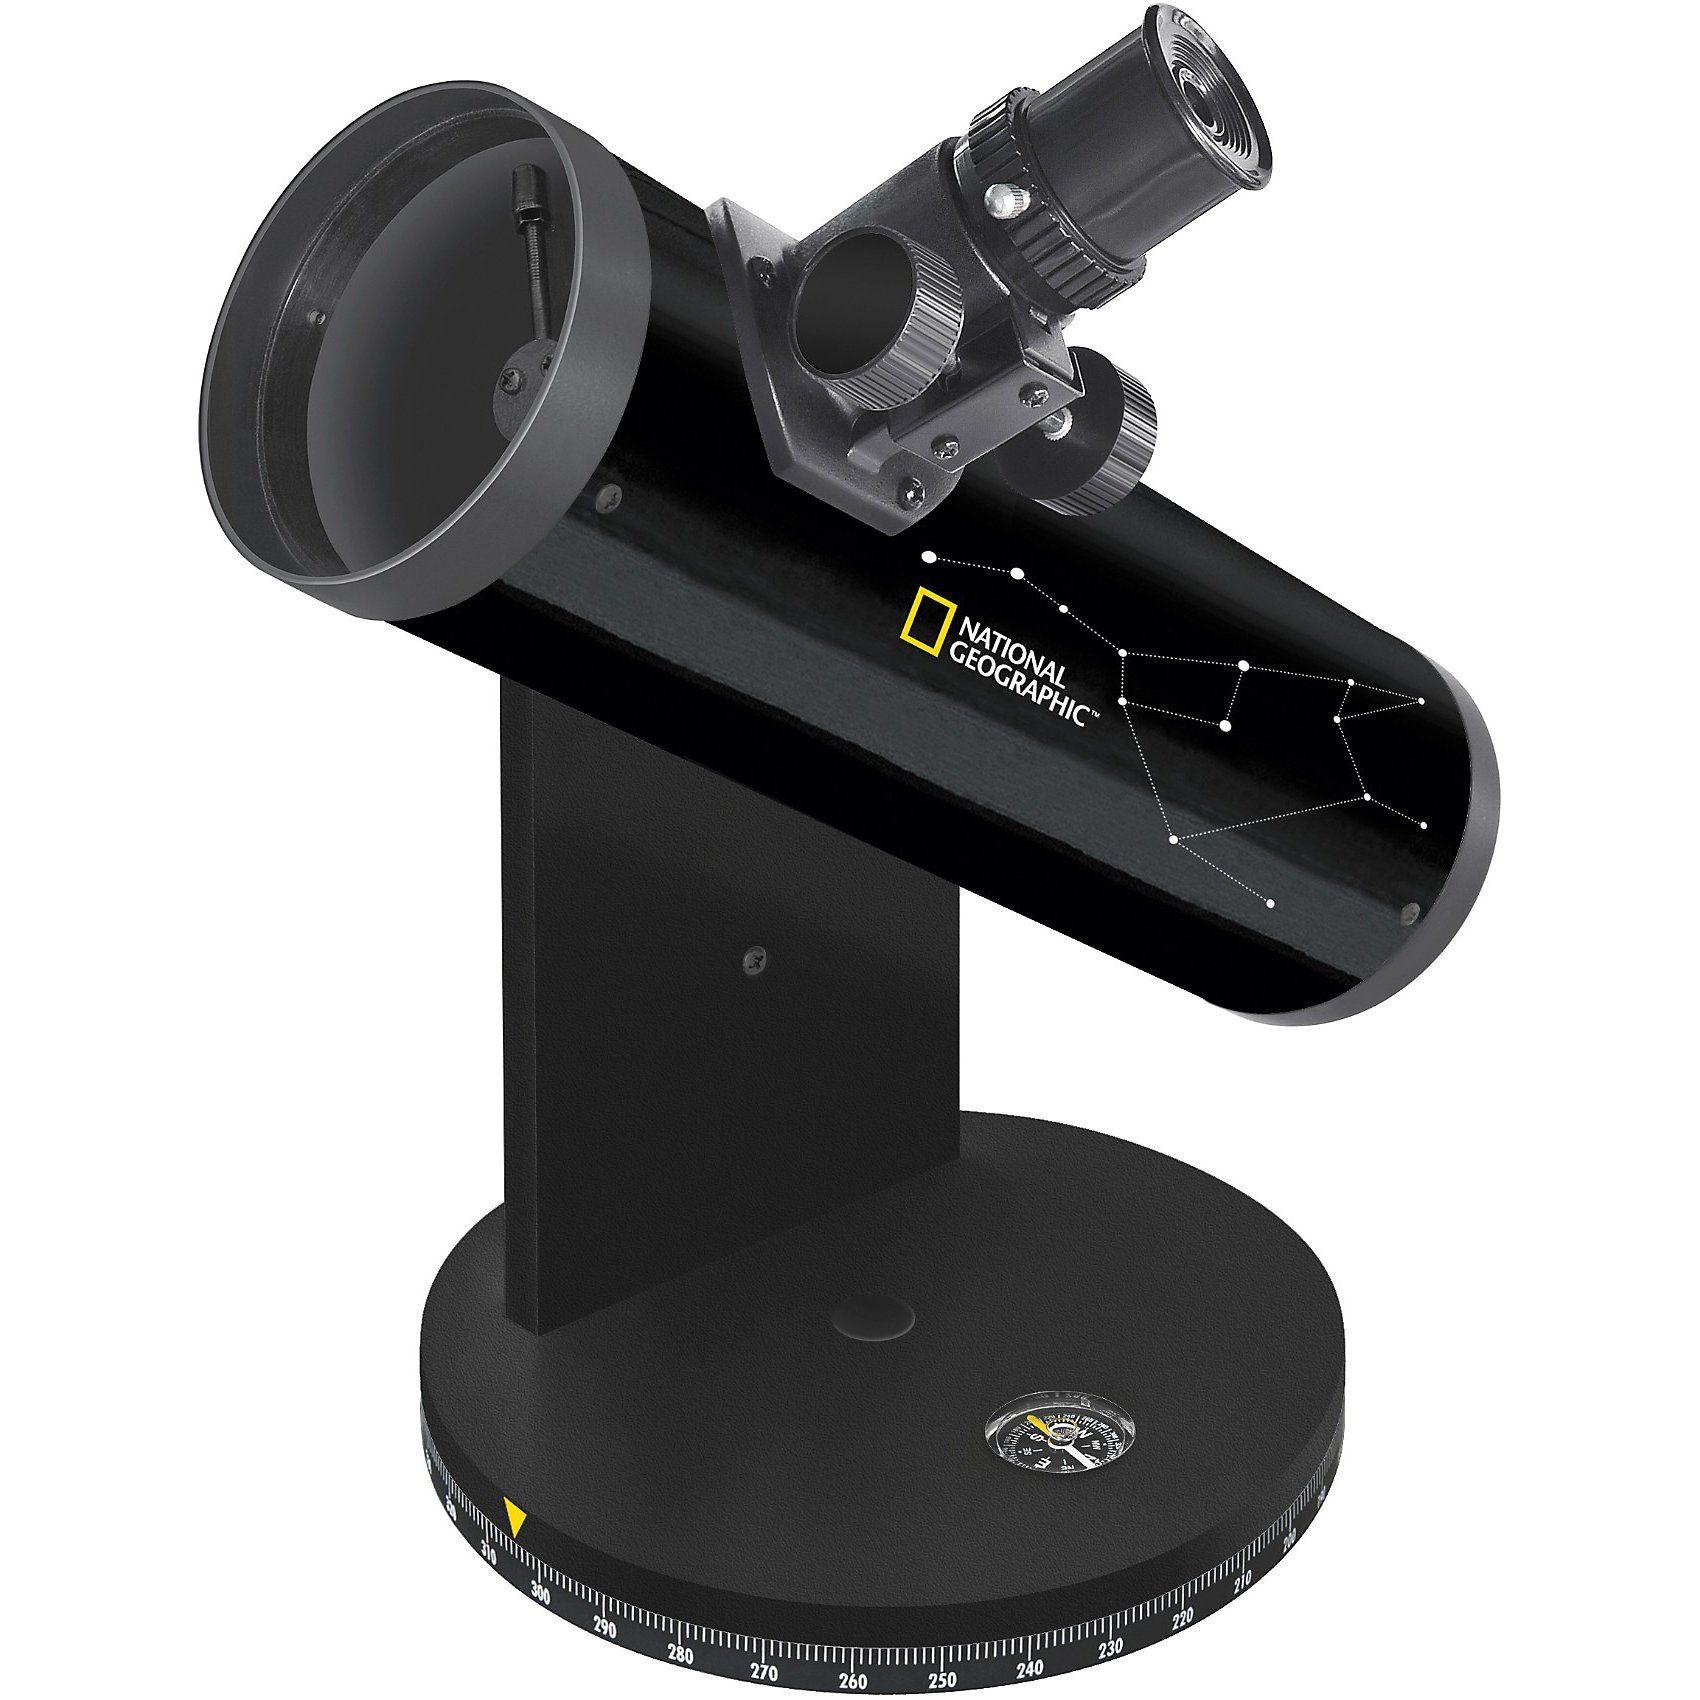 Bresser National Geographic 76/350 Kompakt Teleskop